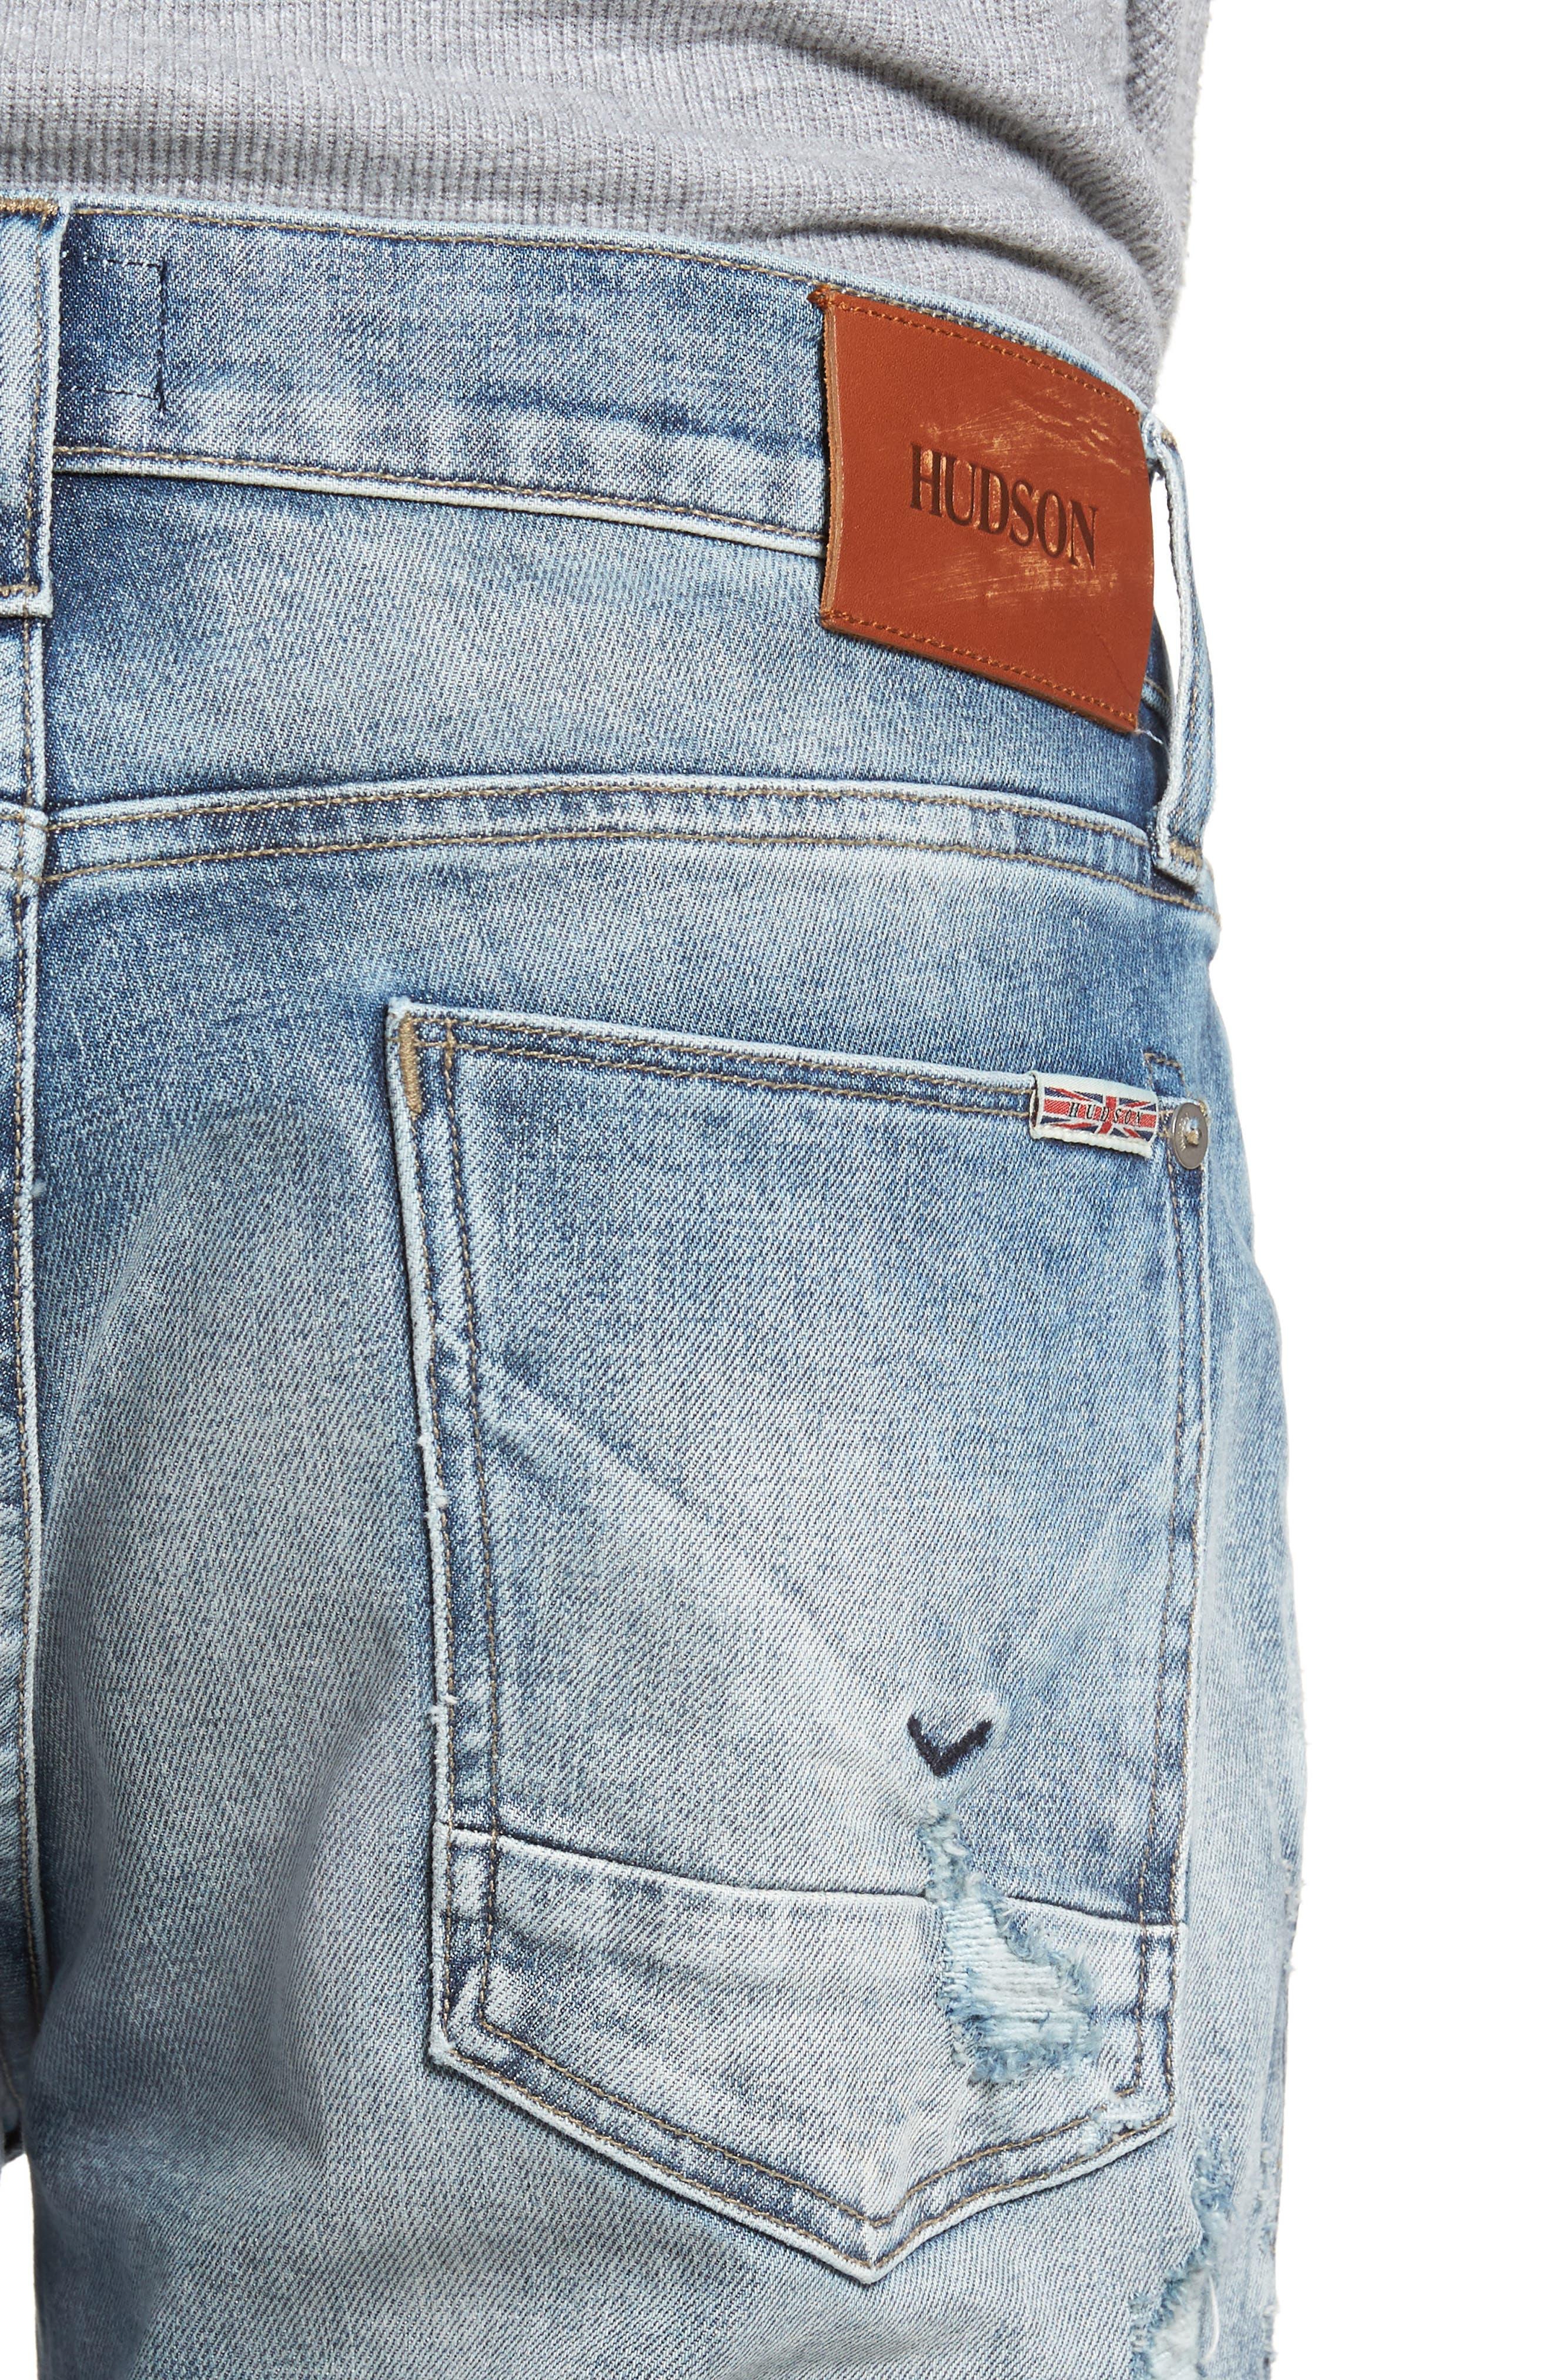 Blake Slim Fit Jeans,                             Alternate thumbnail 4, color,                             451